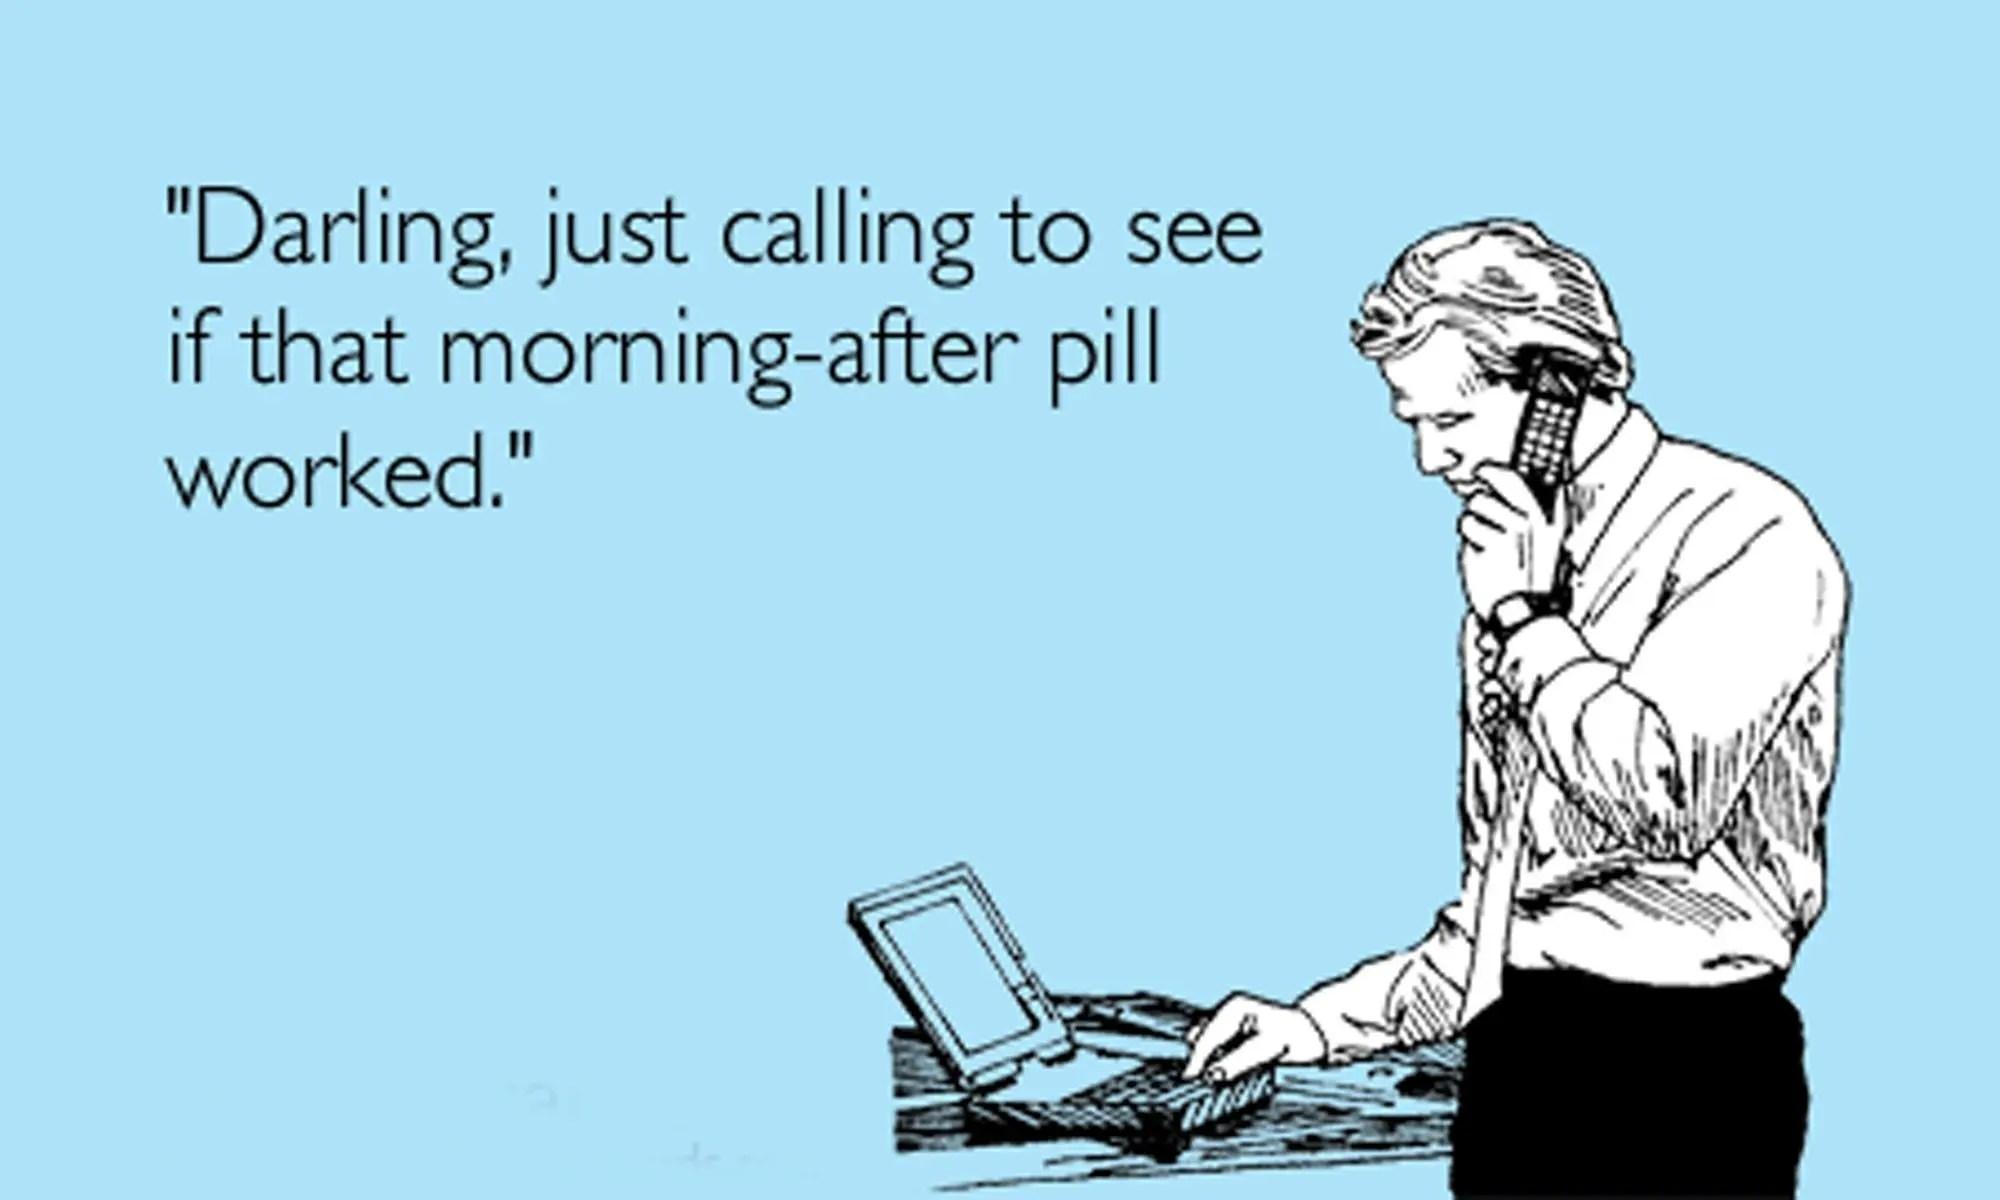 morning-after pill Archives - Diethylstilbestrol DES